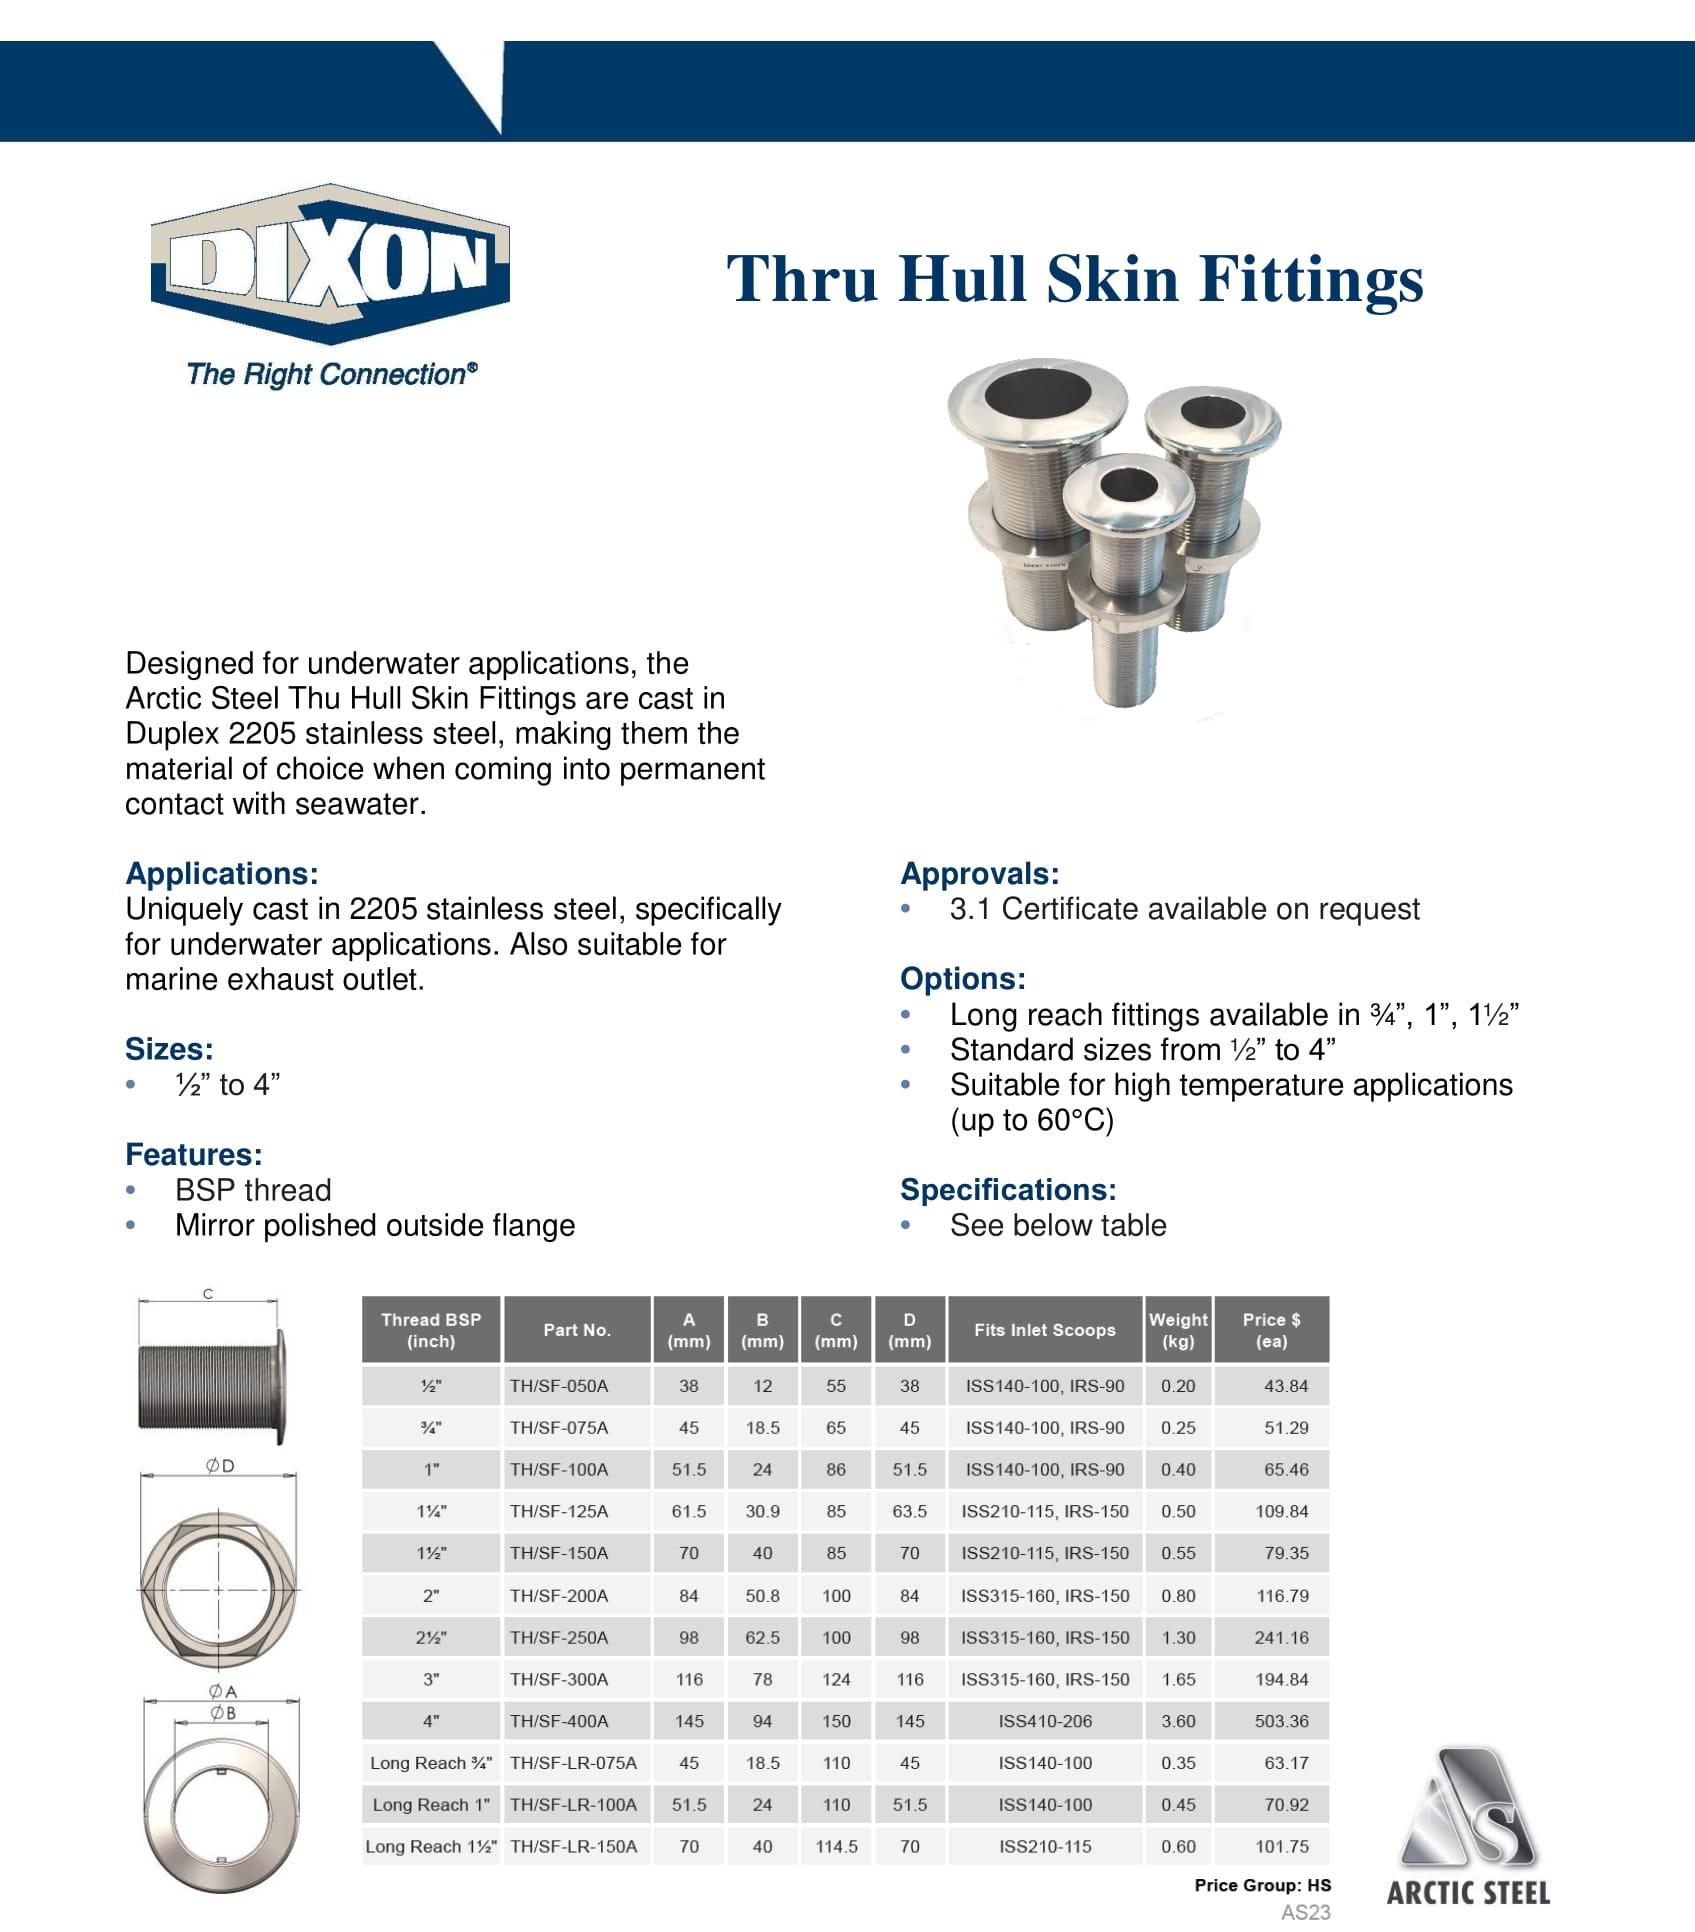 Arctic Steel Strainers - Thru Hull Skin Fittings